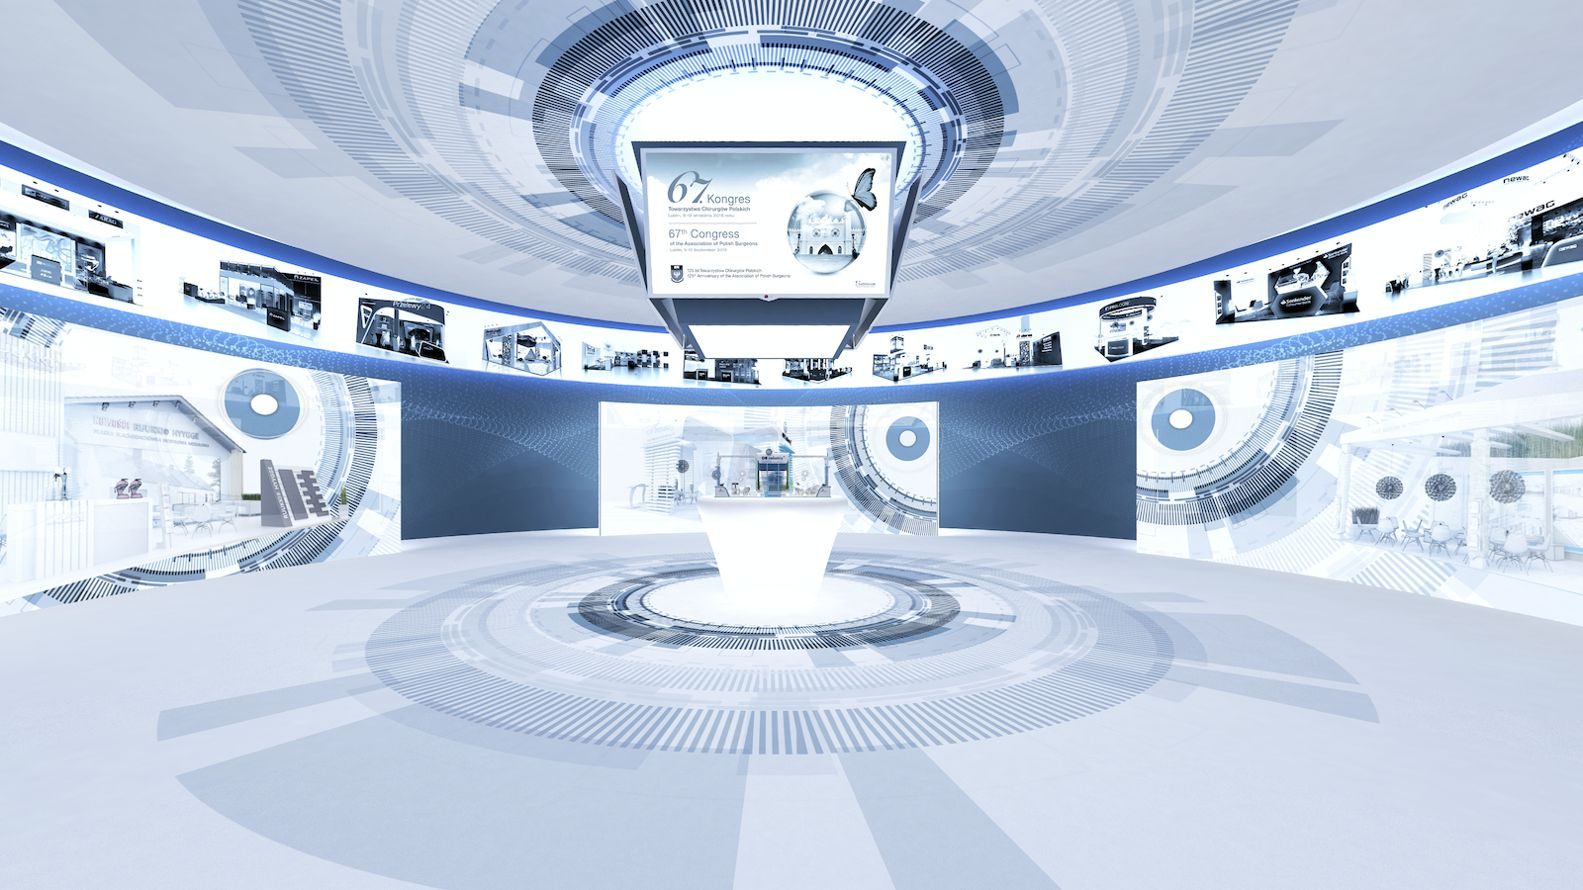 Promenade virtuelle 360